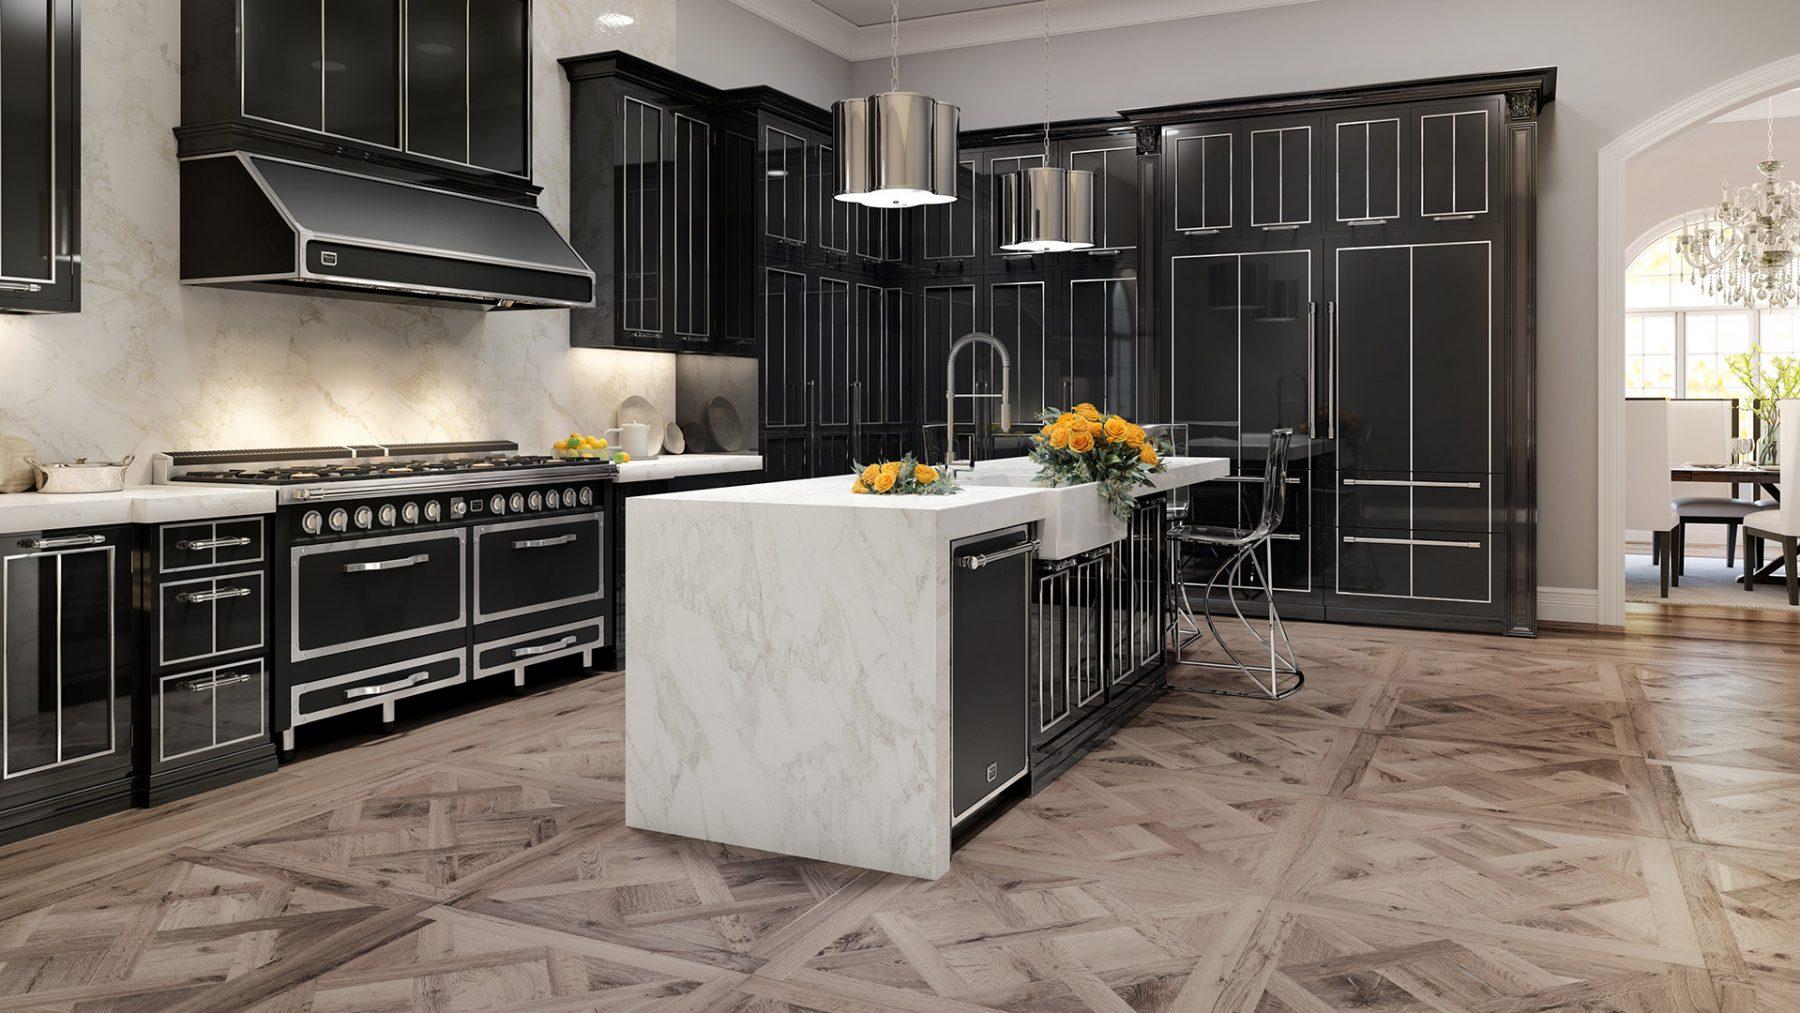 Glamour kitchen 3D render photorealistic